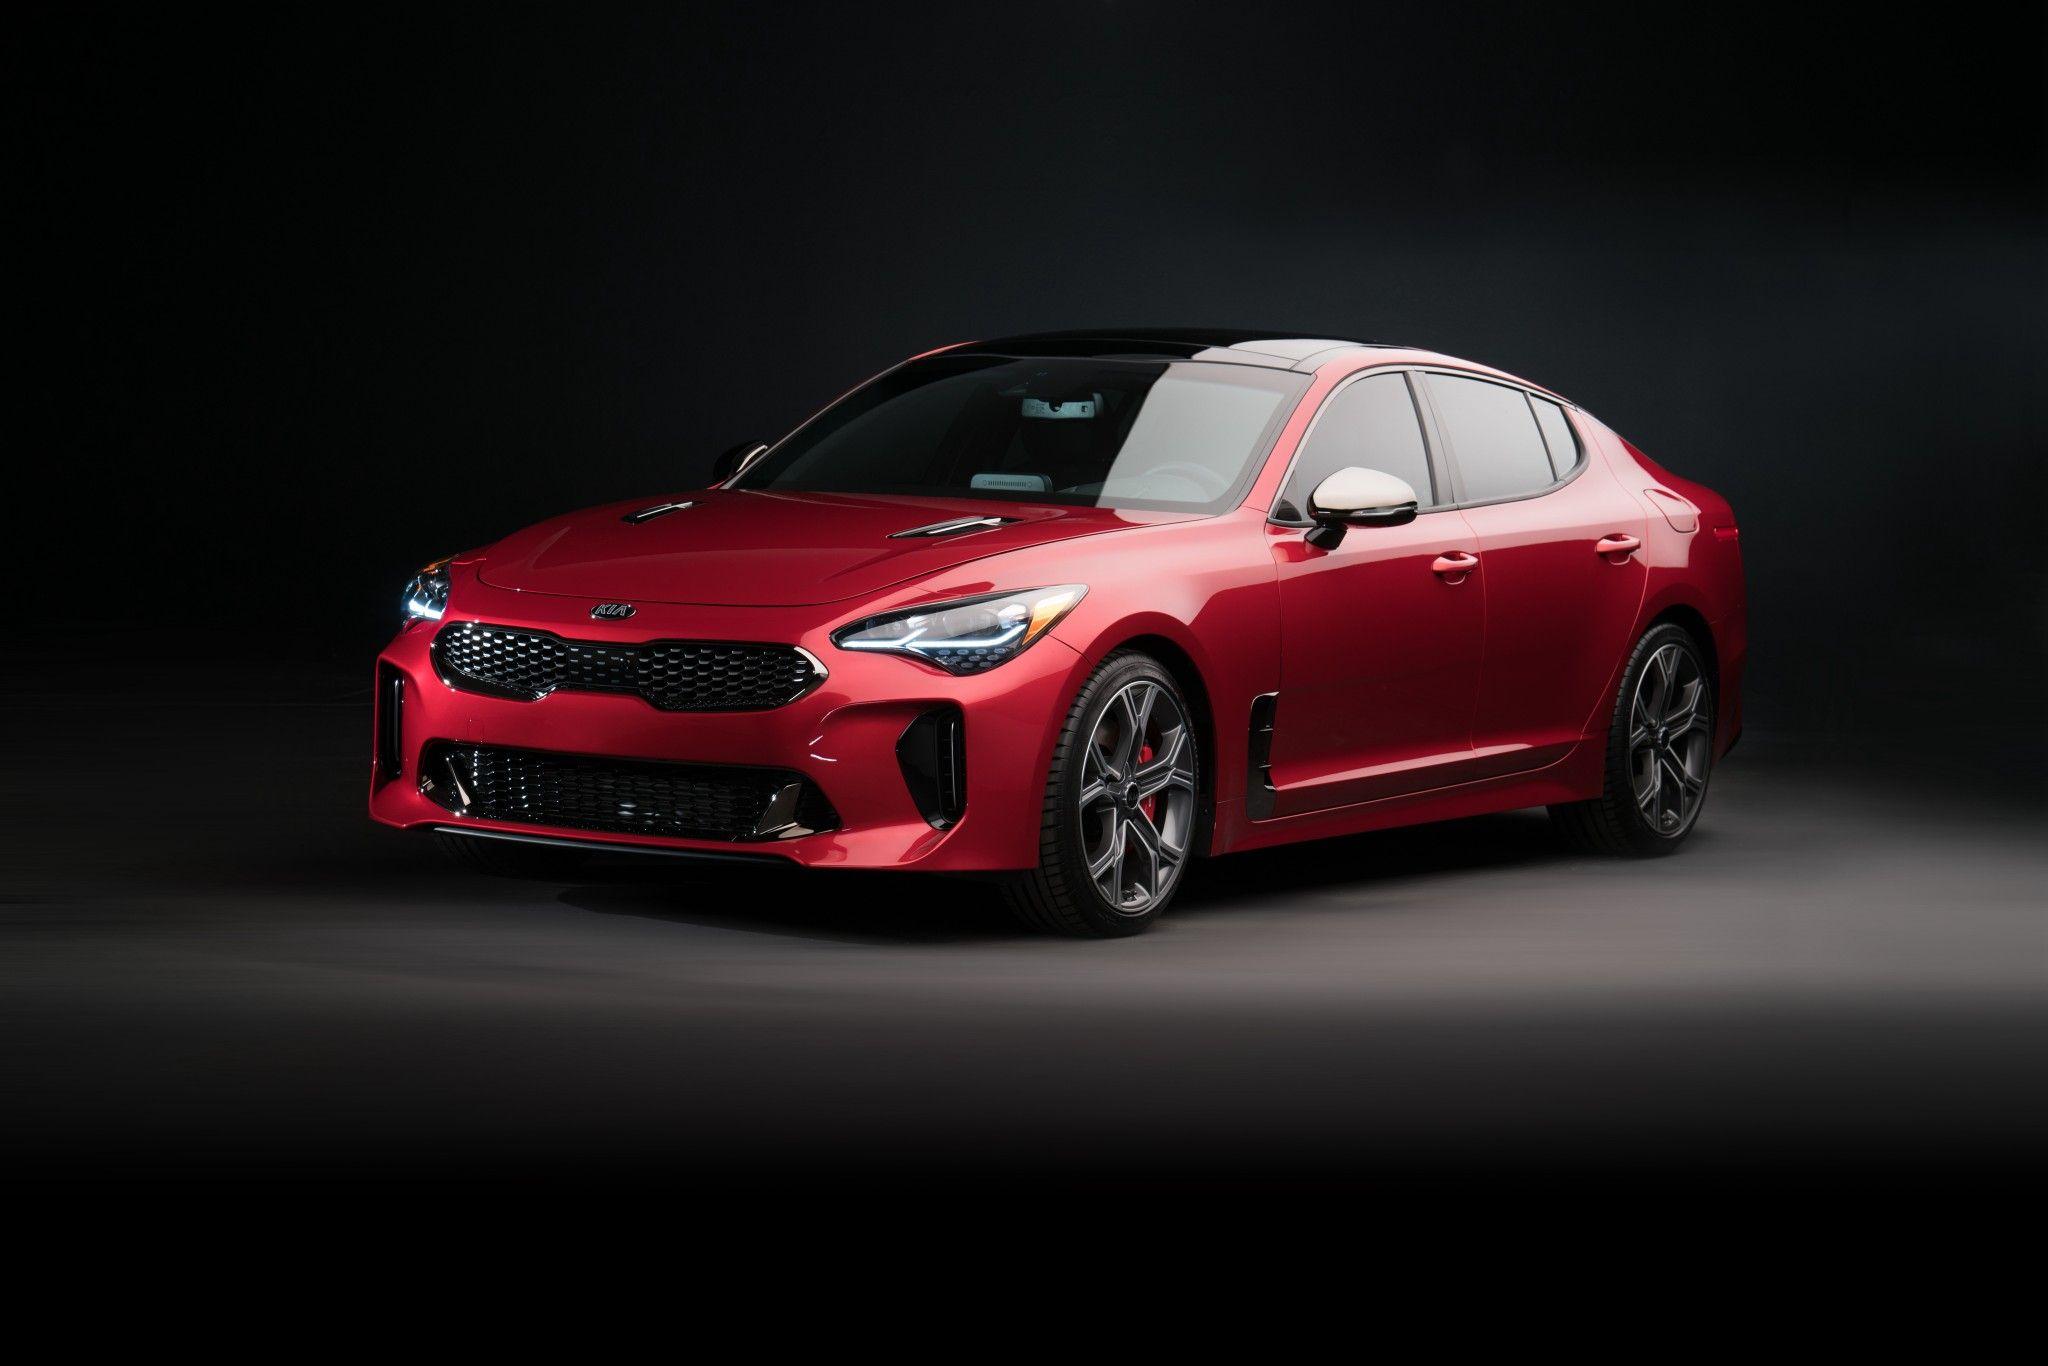 2018 Kia Stinger Gt 4k Hd Autos